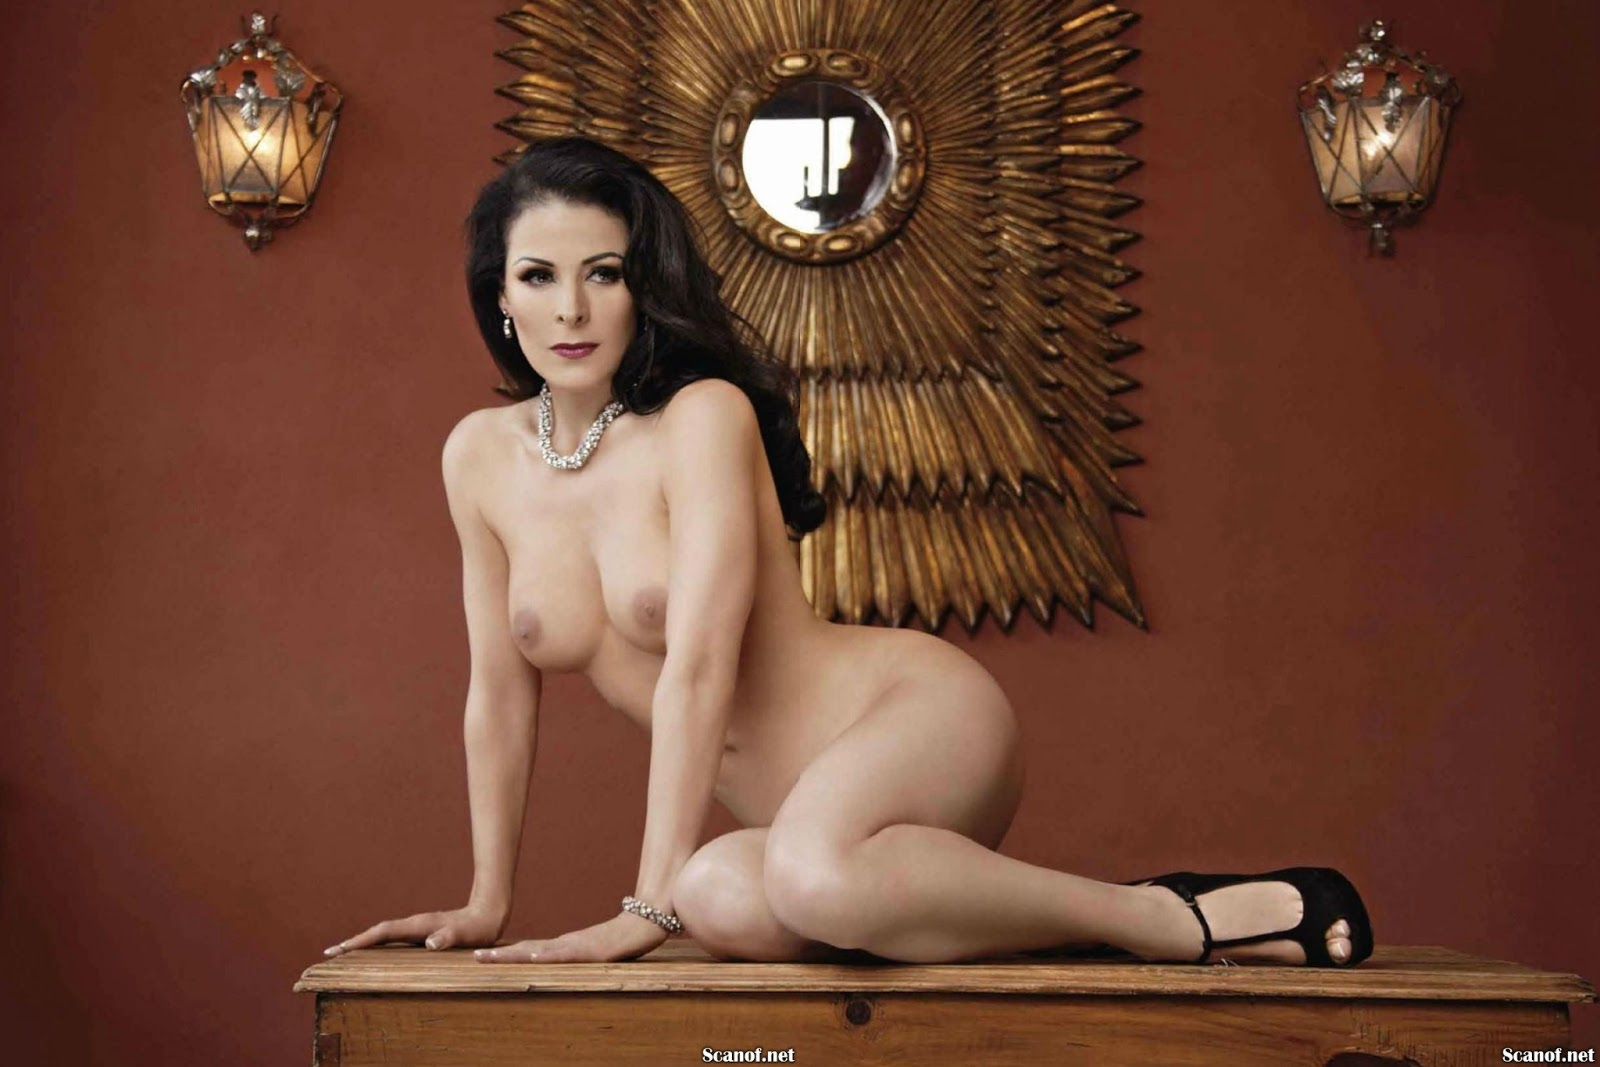 luordes-munguia-video-porn-nude-blue-film-images